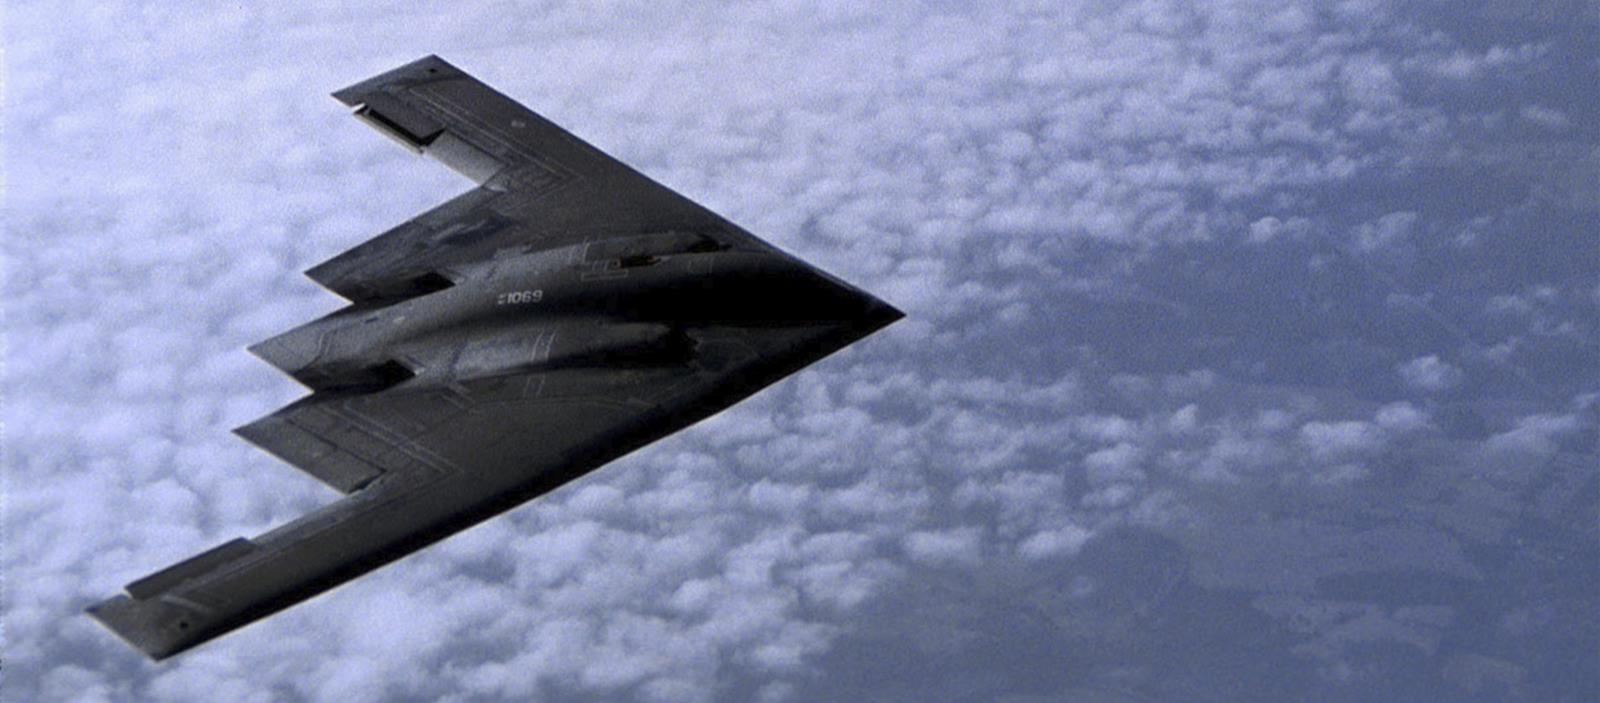 Air Force Northrop Grumman B-2 Stealth Bomber | Minnesota